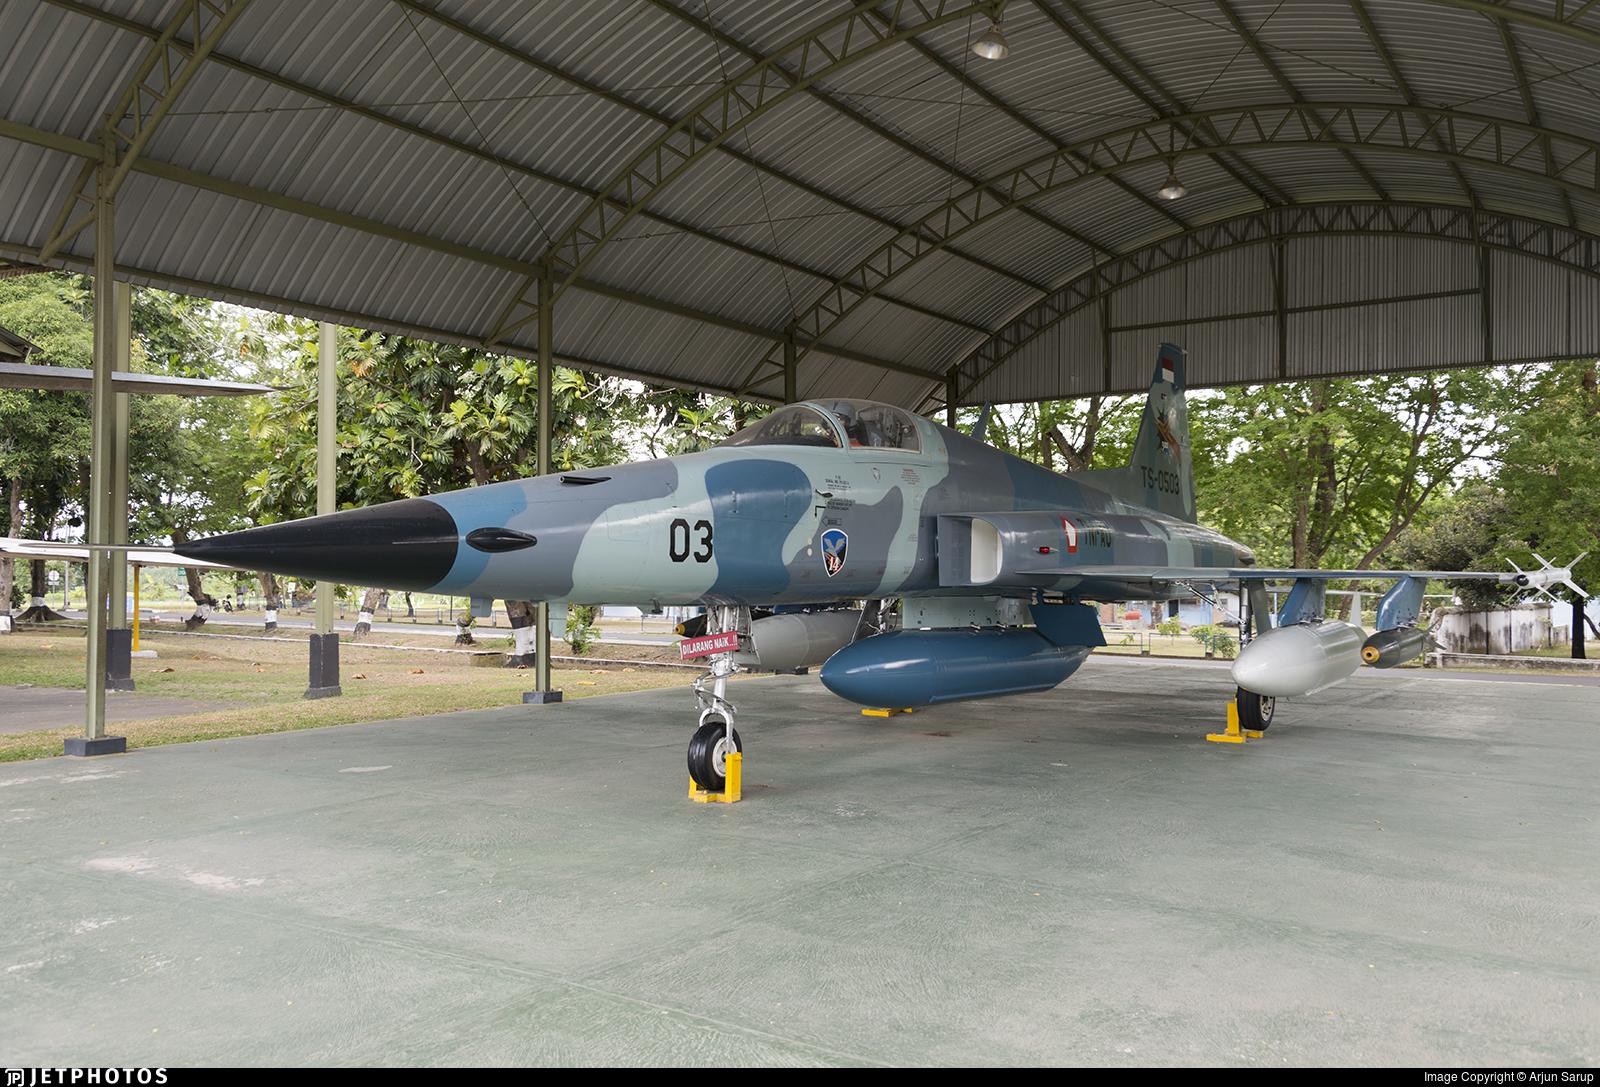 TS-0503 - Northrop F-5E Tiger II - Indonesia - Air Force